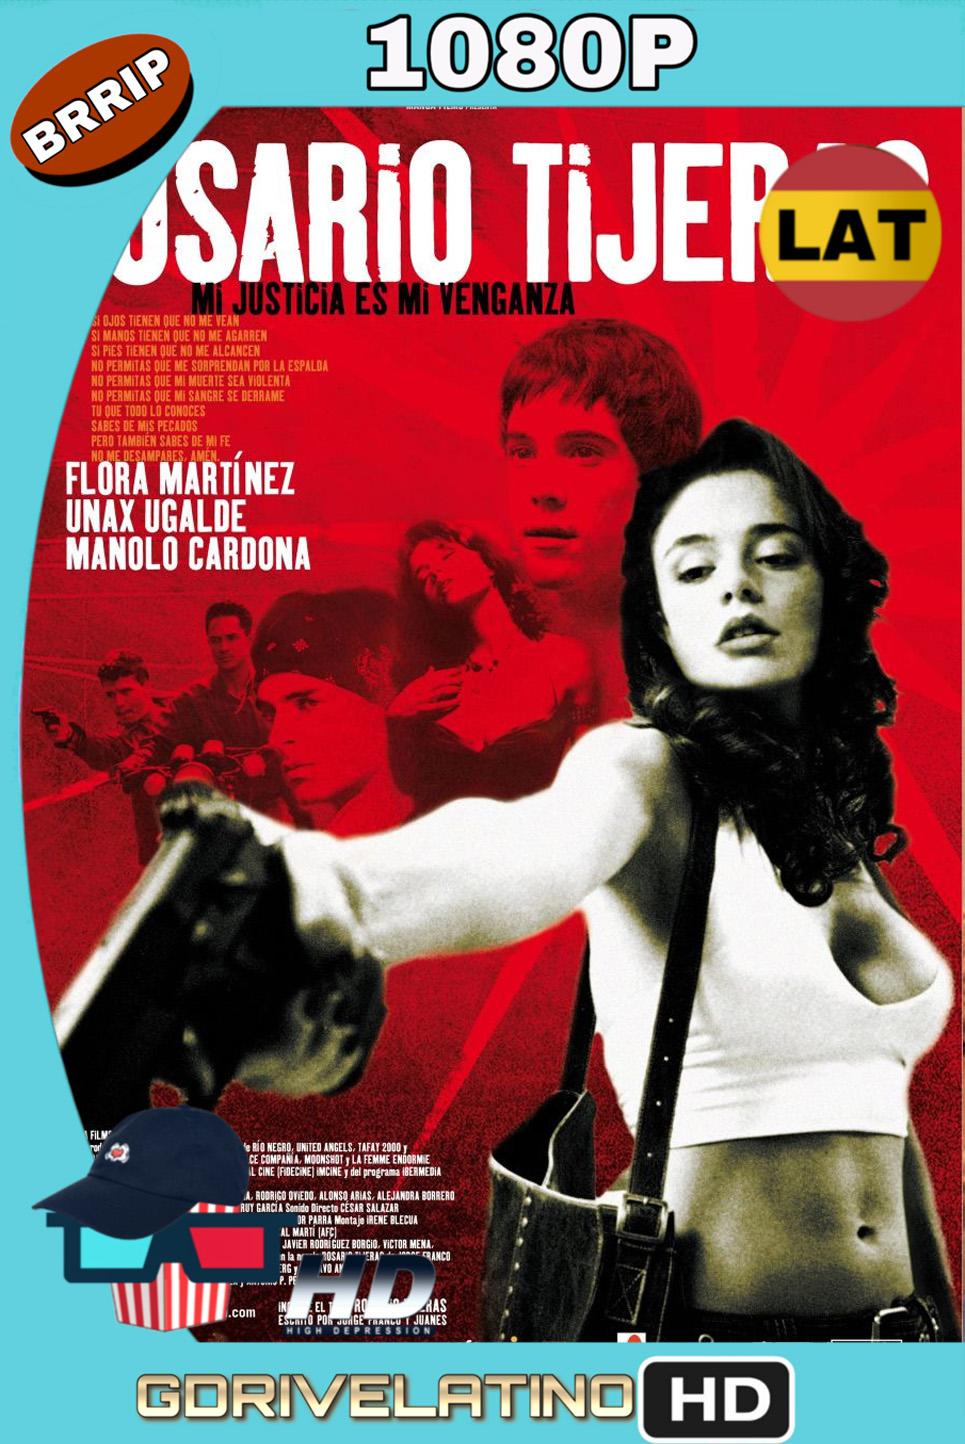 Rosario Tijeras (2005) BRRIP 1080p Latino MKV